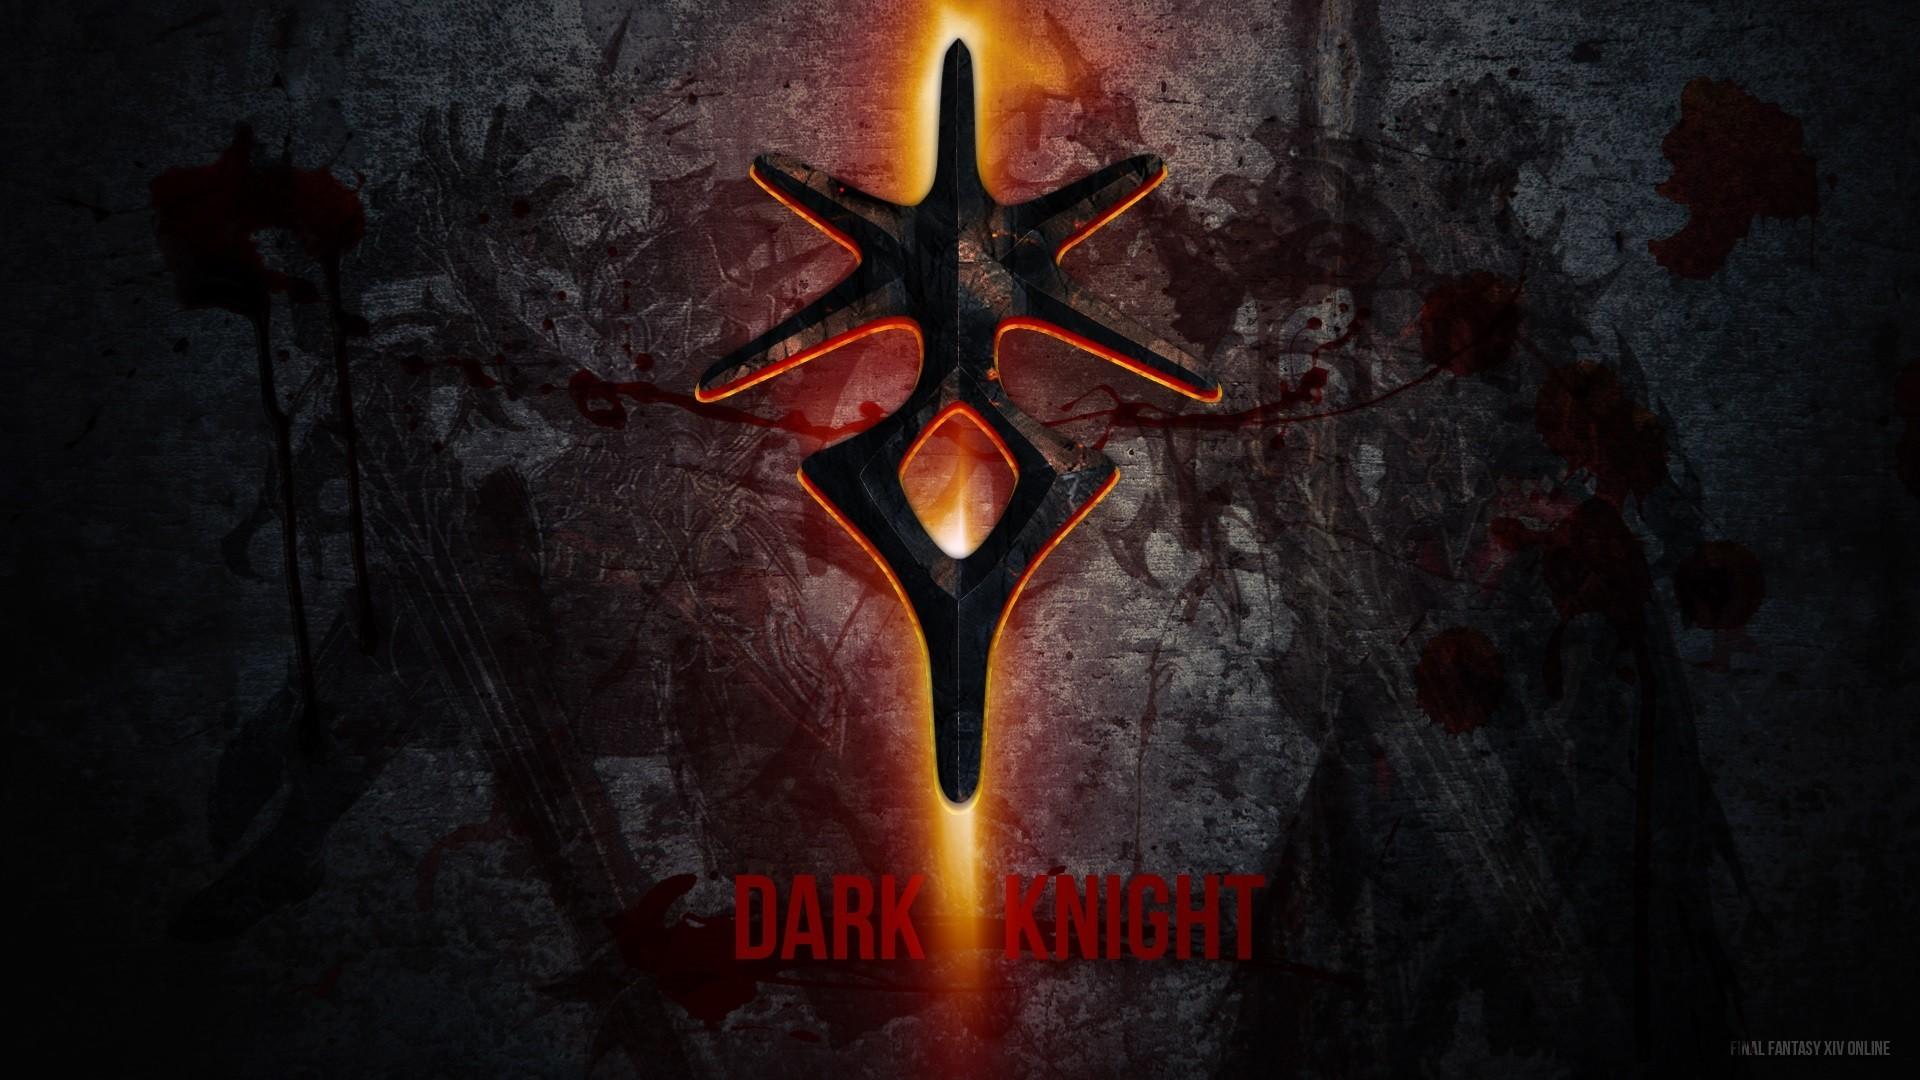 13 final fantasy xiv a realm reborn video games eorzea cafe dark knight  wallpaper | wallpaper tags | Wallpaper Better